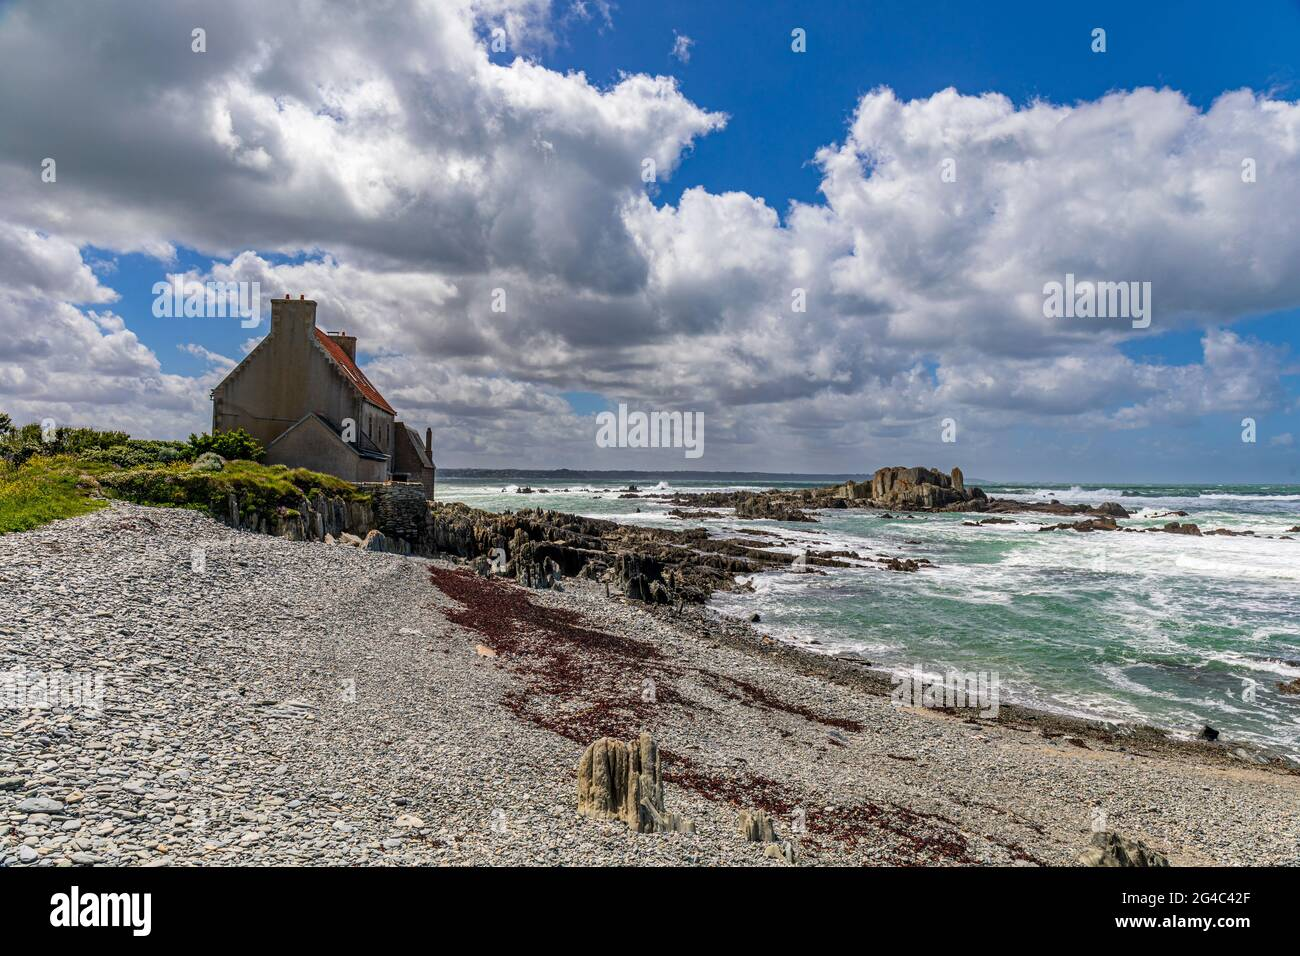 Turbulent sea in Pointe de Sehar, Tredrez-Locquemeau, Cotes d'Armor, Brittany, France Stock Photo